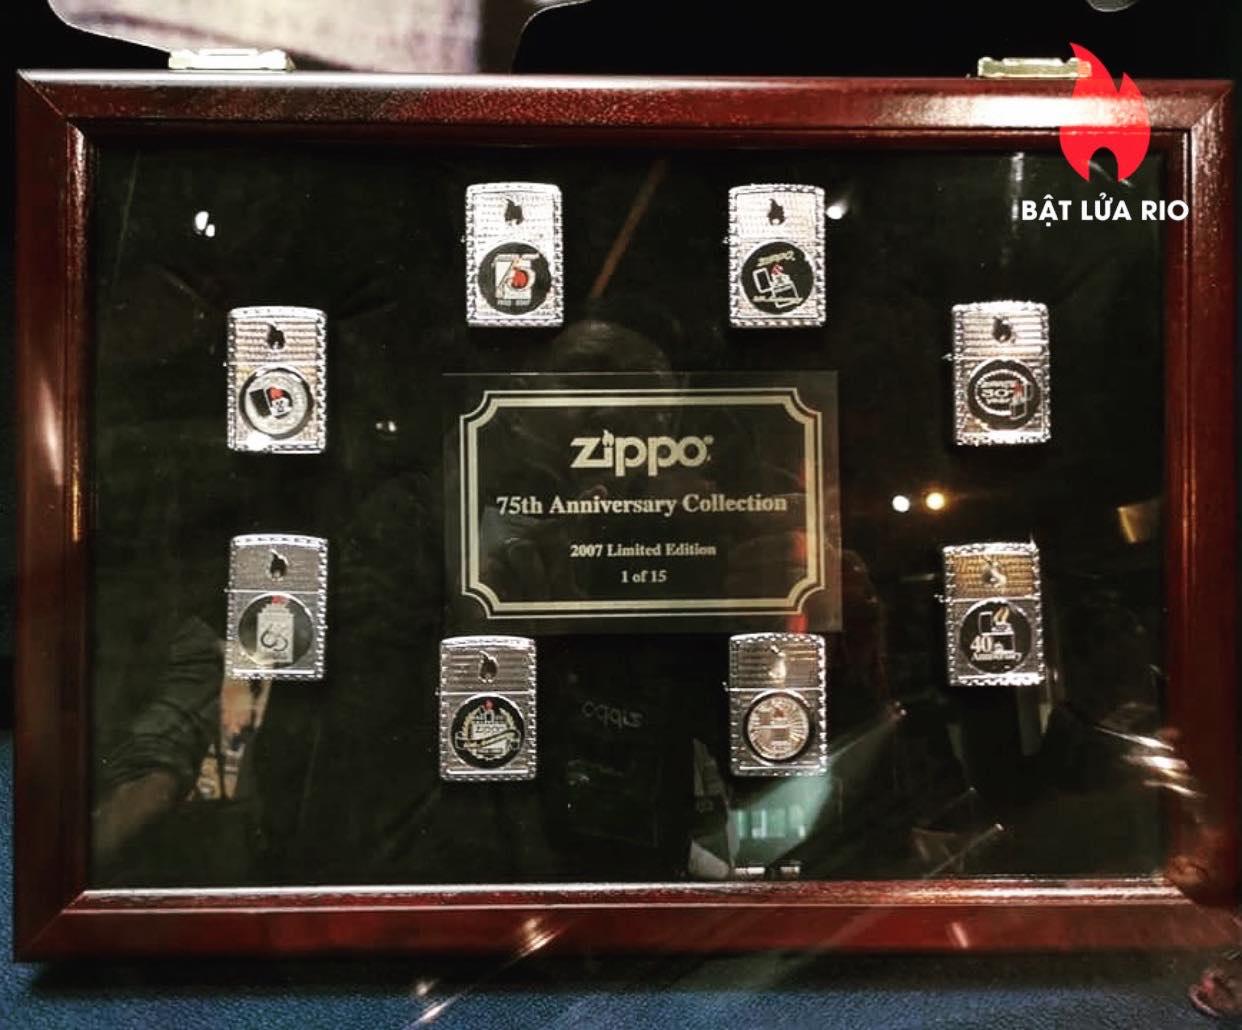 THAM QUAN BẢO TÀNG ZIPPO/CASE - ZIPPO/CASE MUSEUM 43